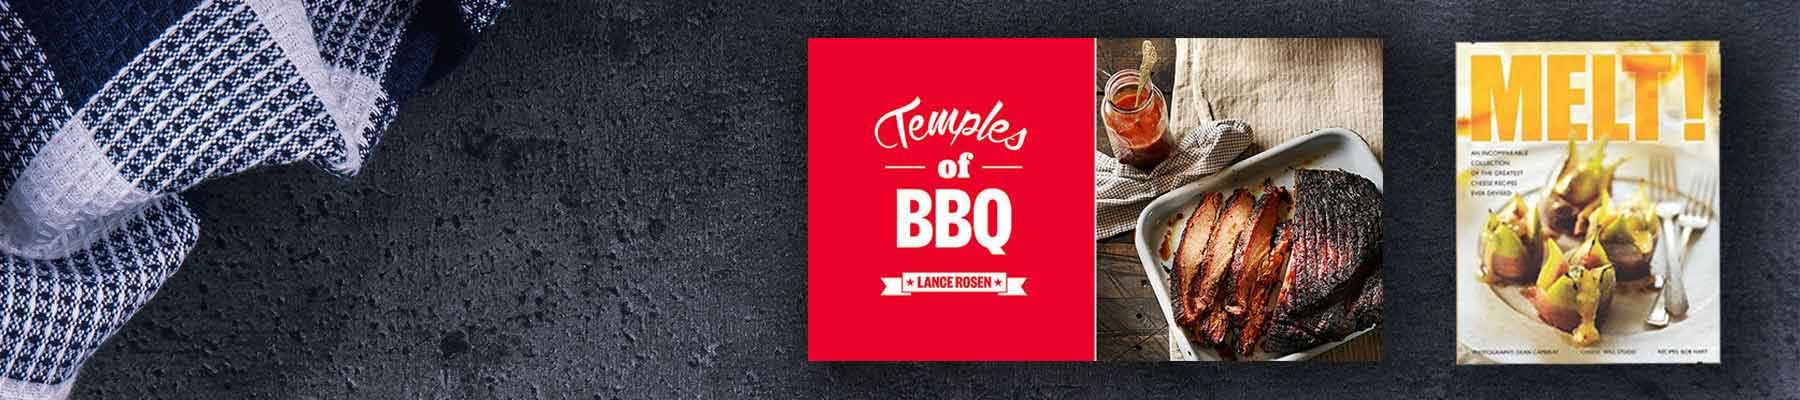 Temples of BBQ | Melt!